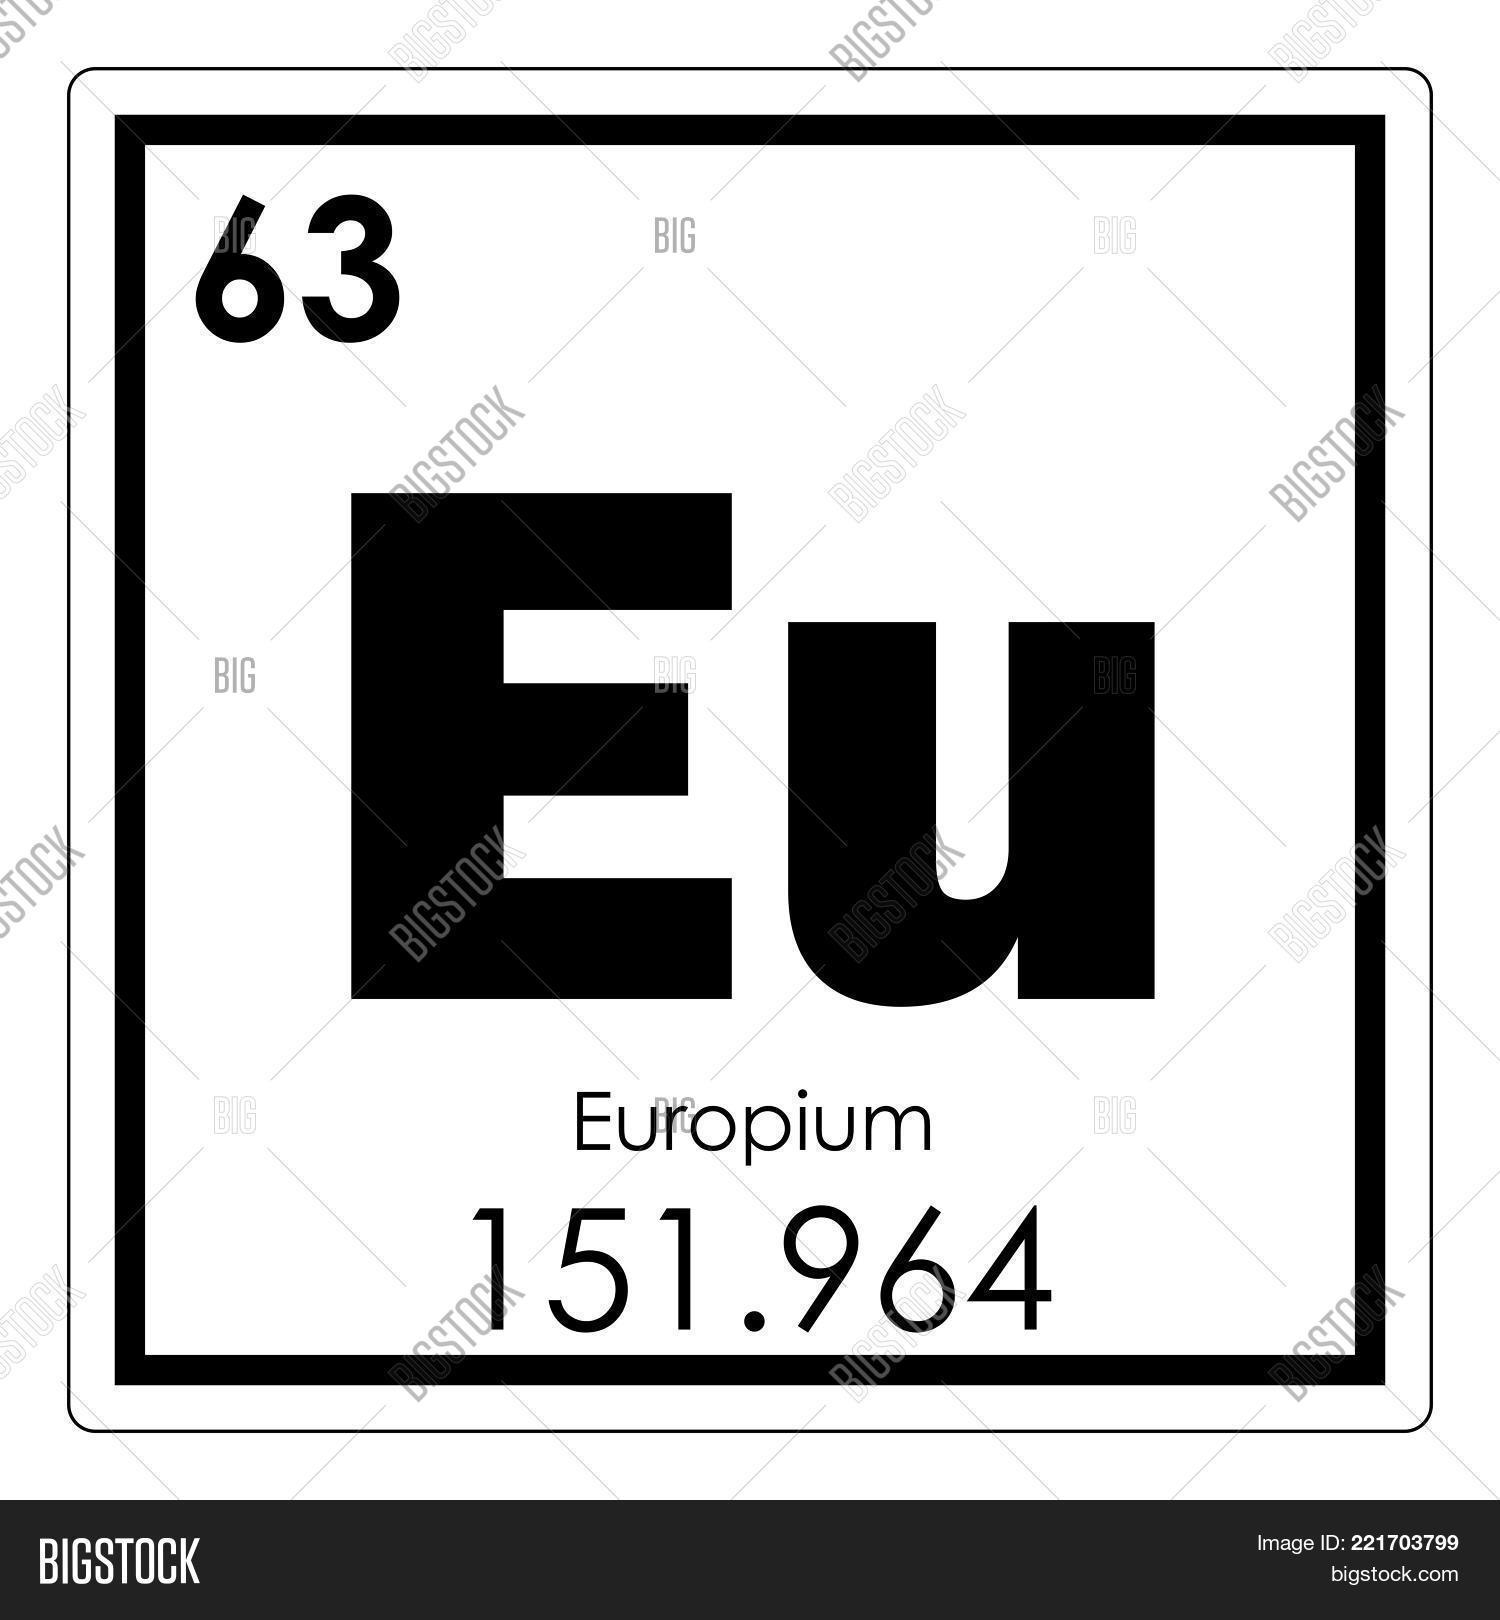 Europium Chemical Image Photo Free Trial Bigstock